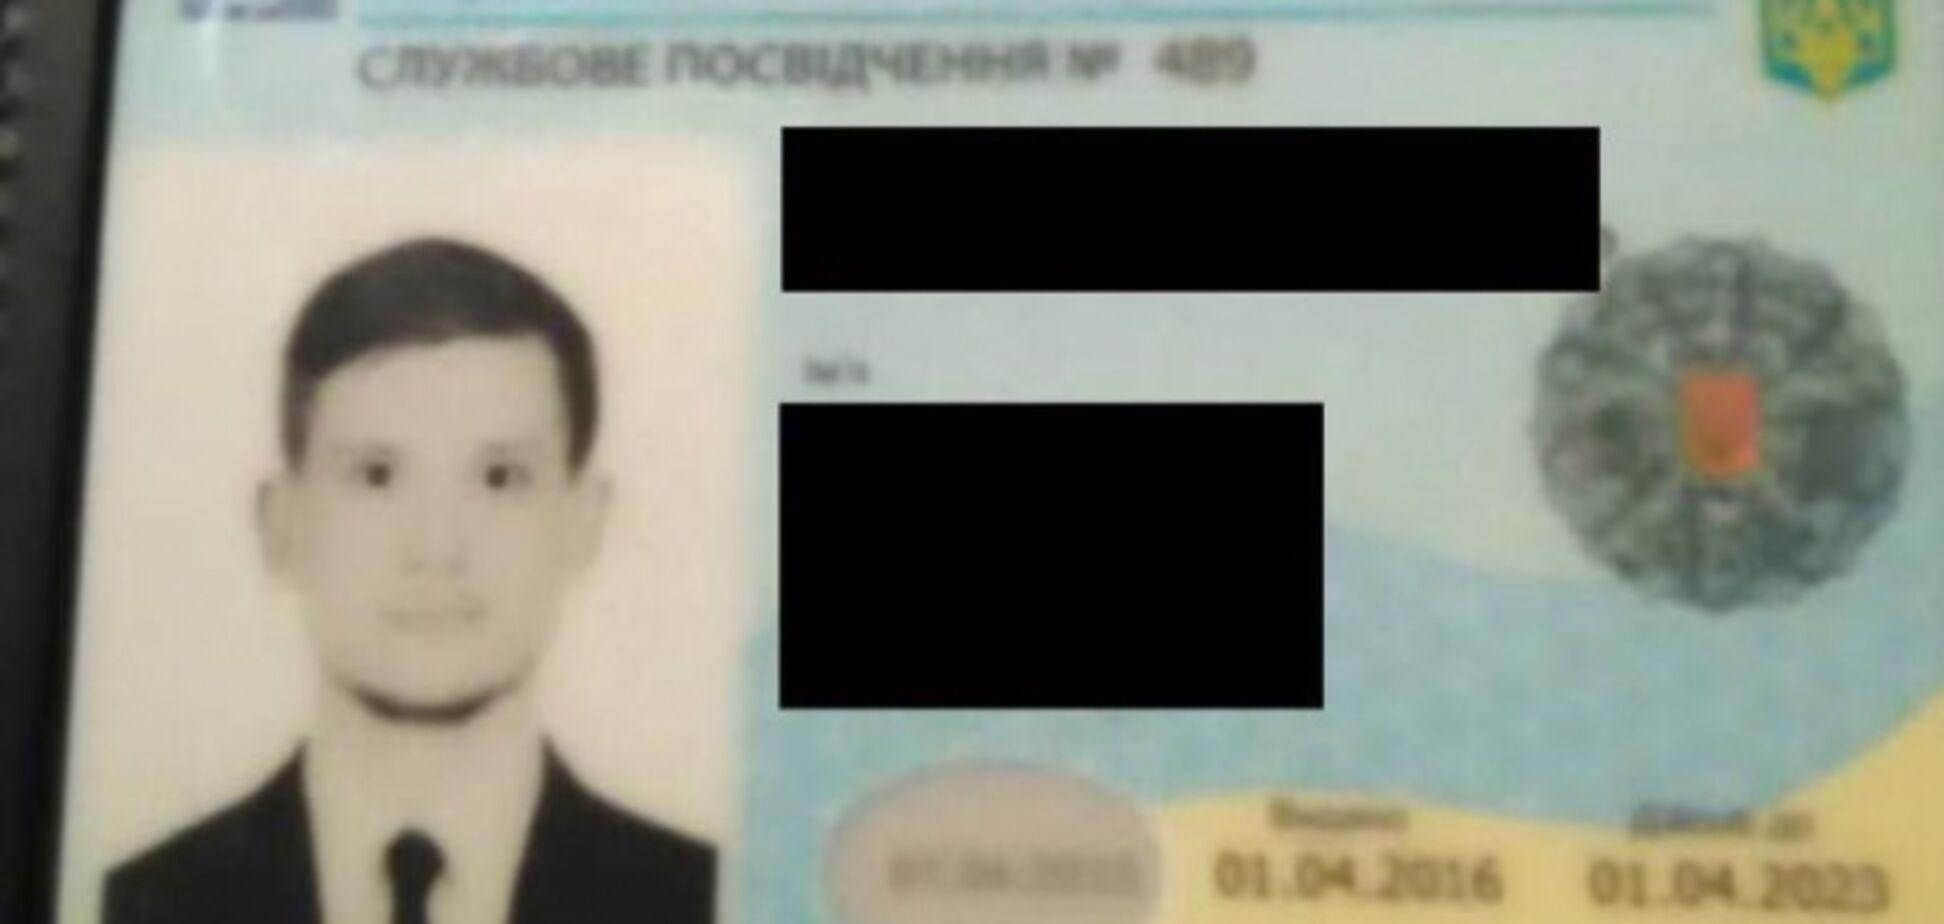 Курил 'траву' в центре Киева: полиция задержала детектива НАБУ